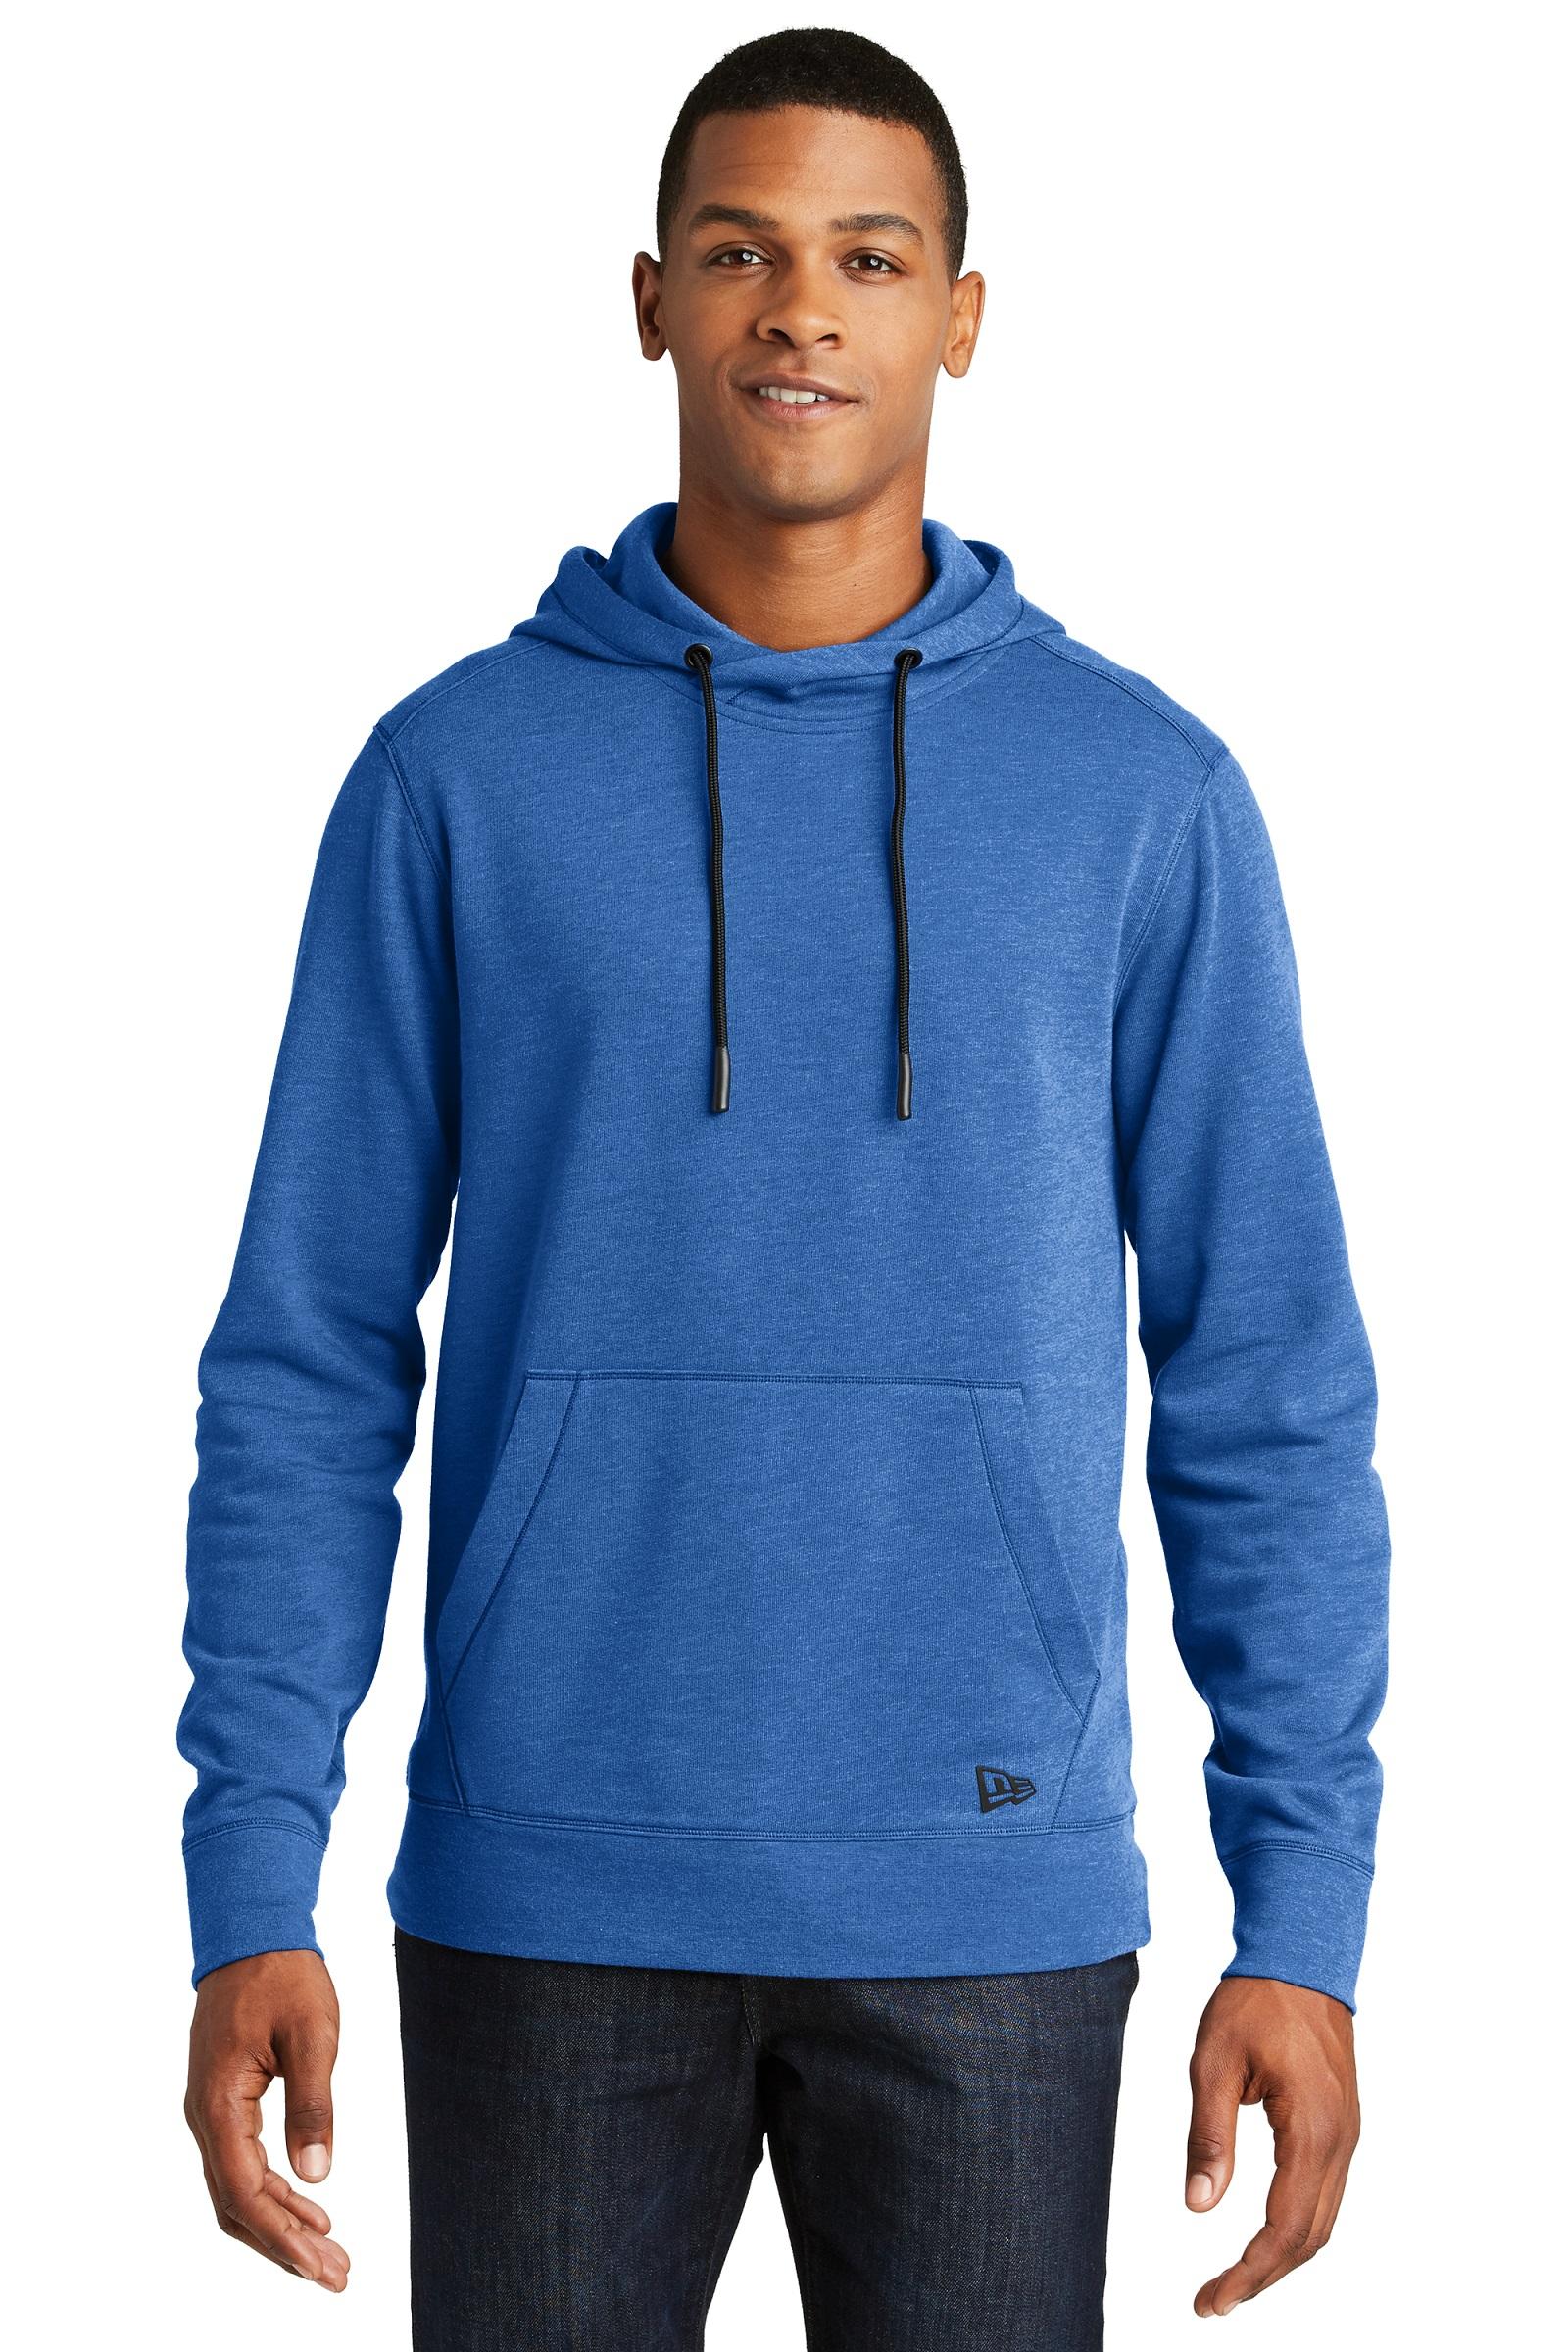 New Era Tri-Blend Fleece Pullover Hoodie